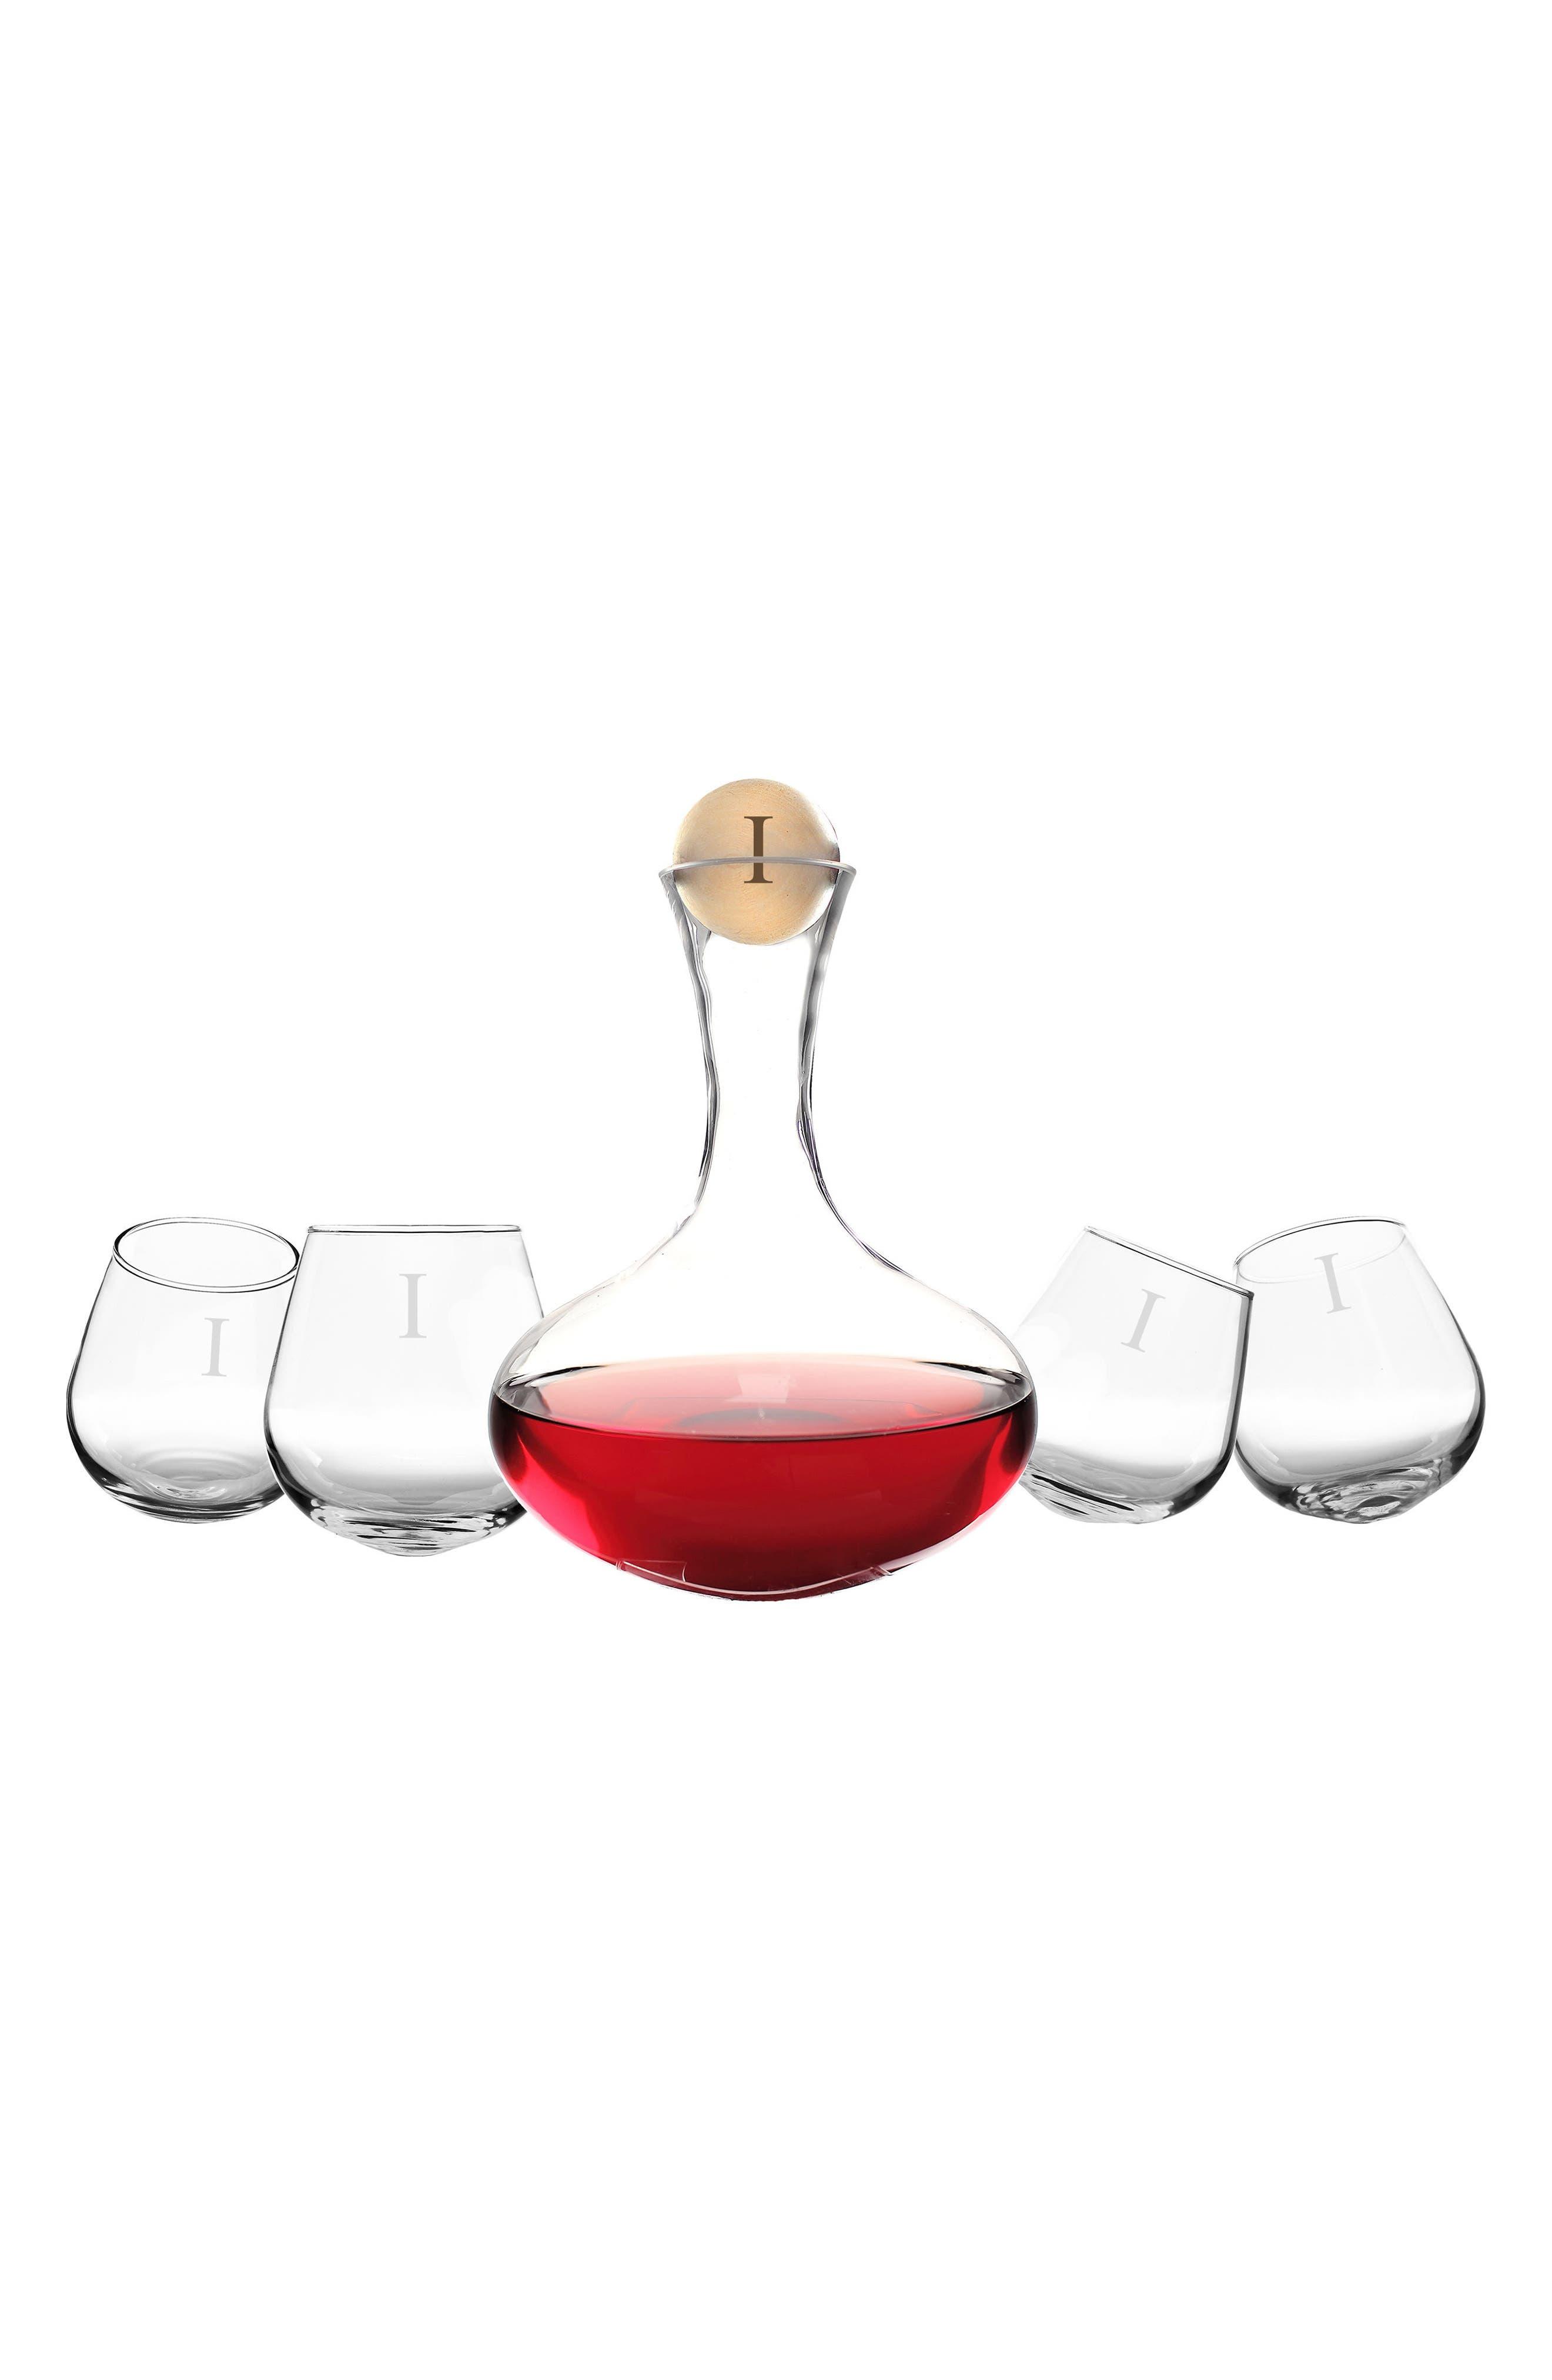 'Tipsy' Monogram Wine Decanter & Stemless Glasses,                             Main thumbnail 1, color,                             I